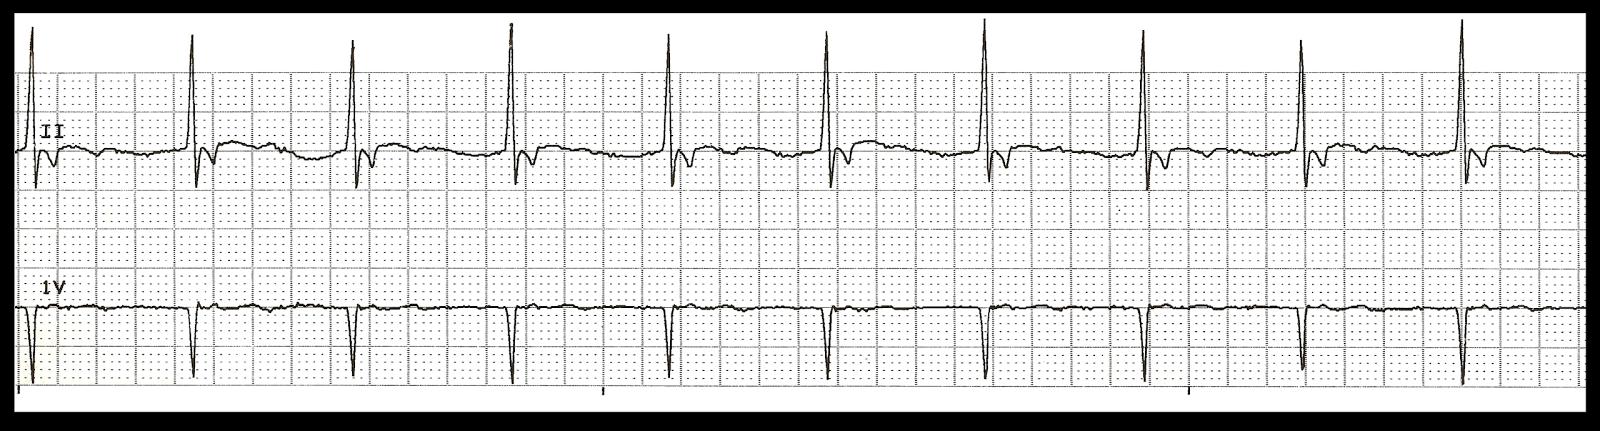 Float Nurse: Practice EKG Strips 381